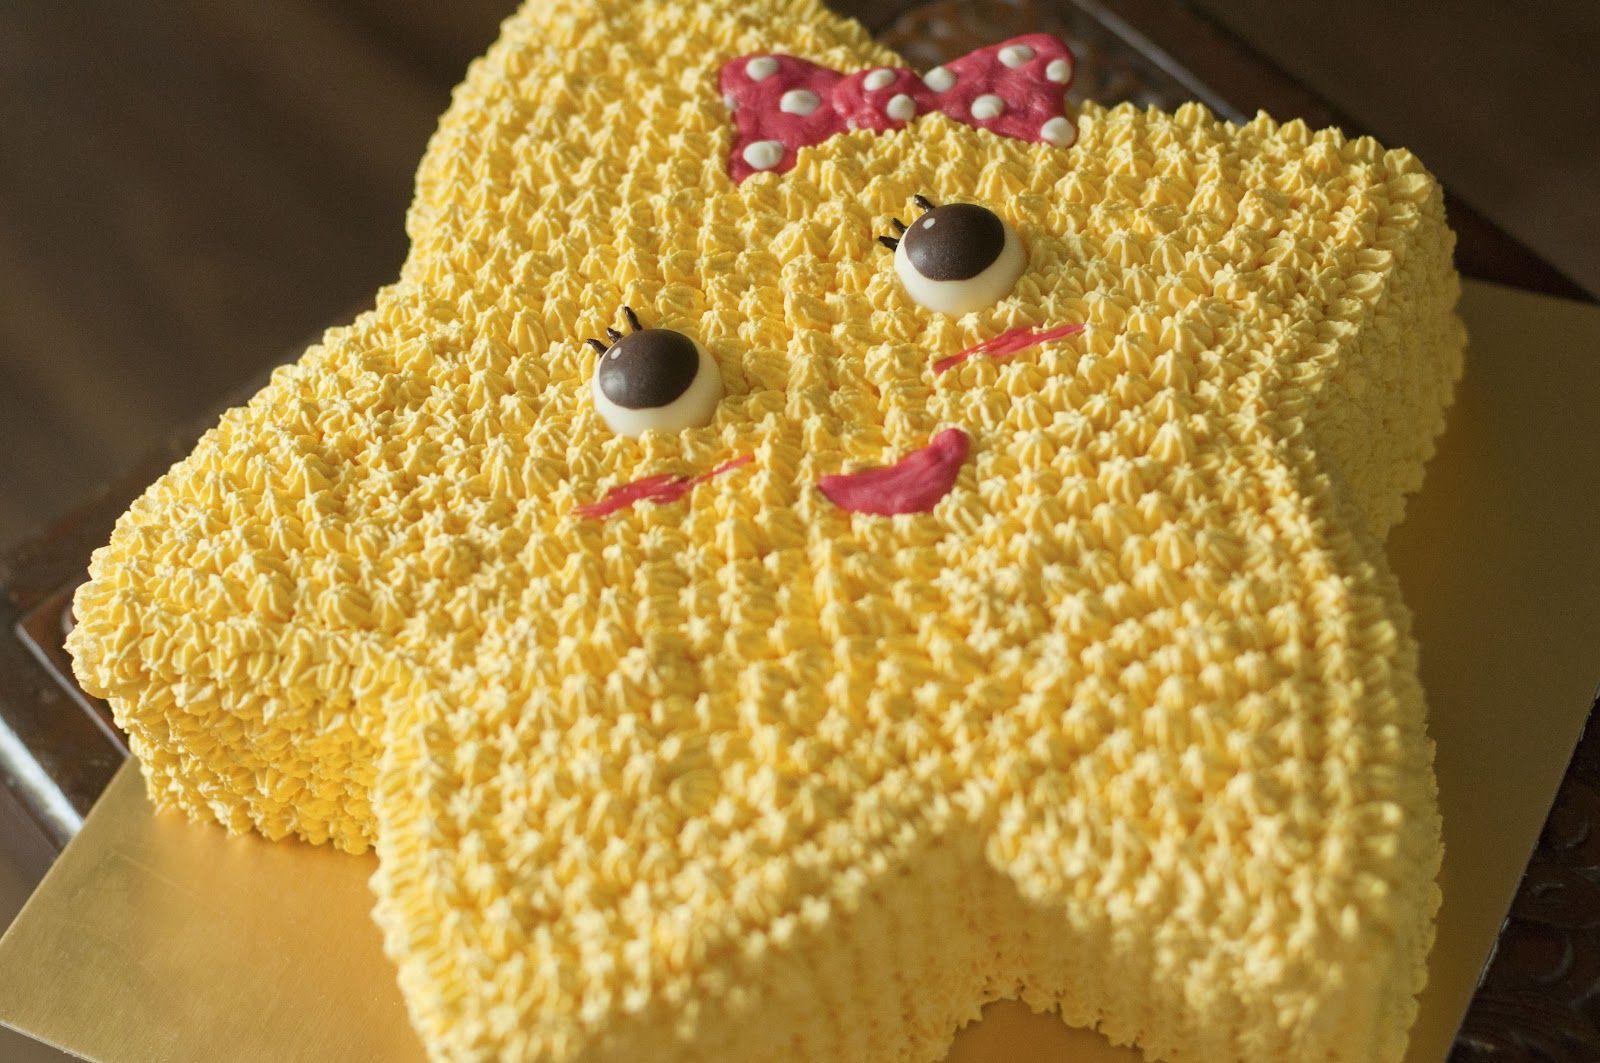 Twinkle Twinkle Little Star Birthday Cakes! Twinkle